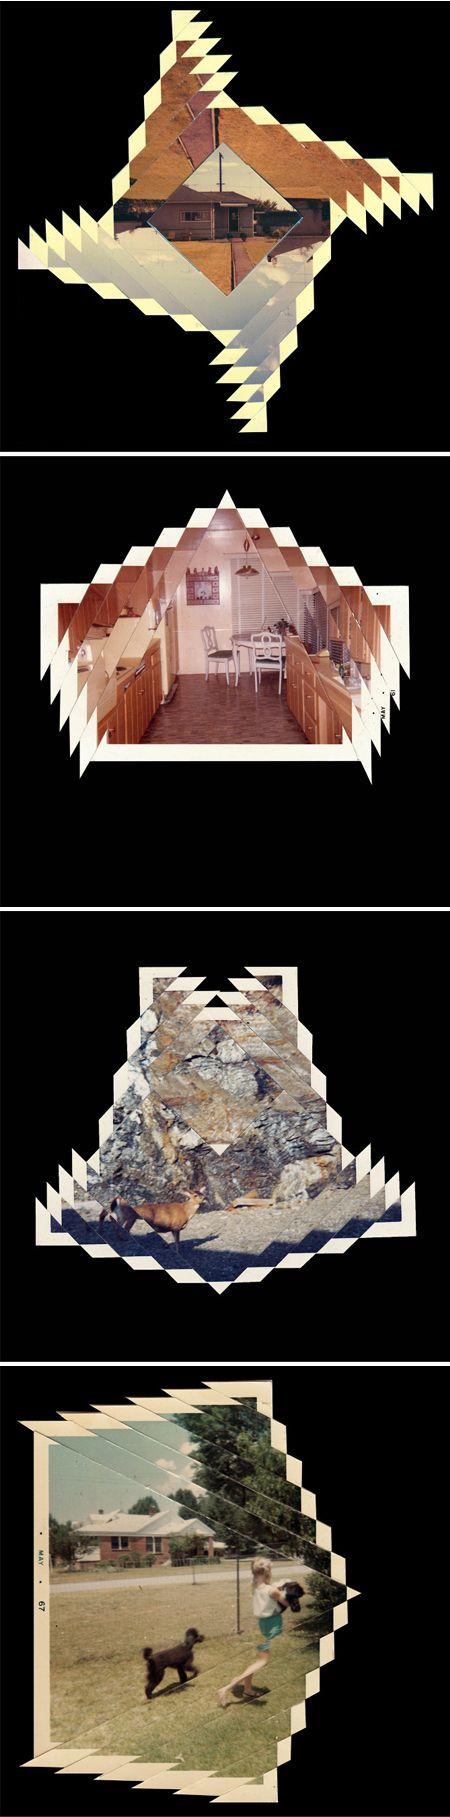 "Randy Grskovic : ""Found Photographs II"" series"